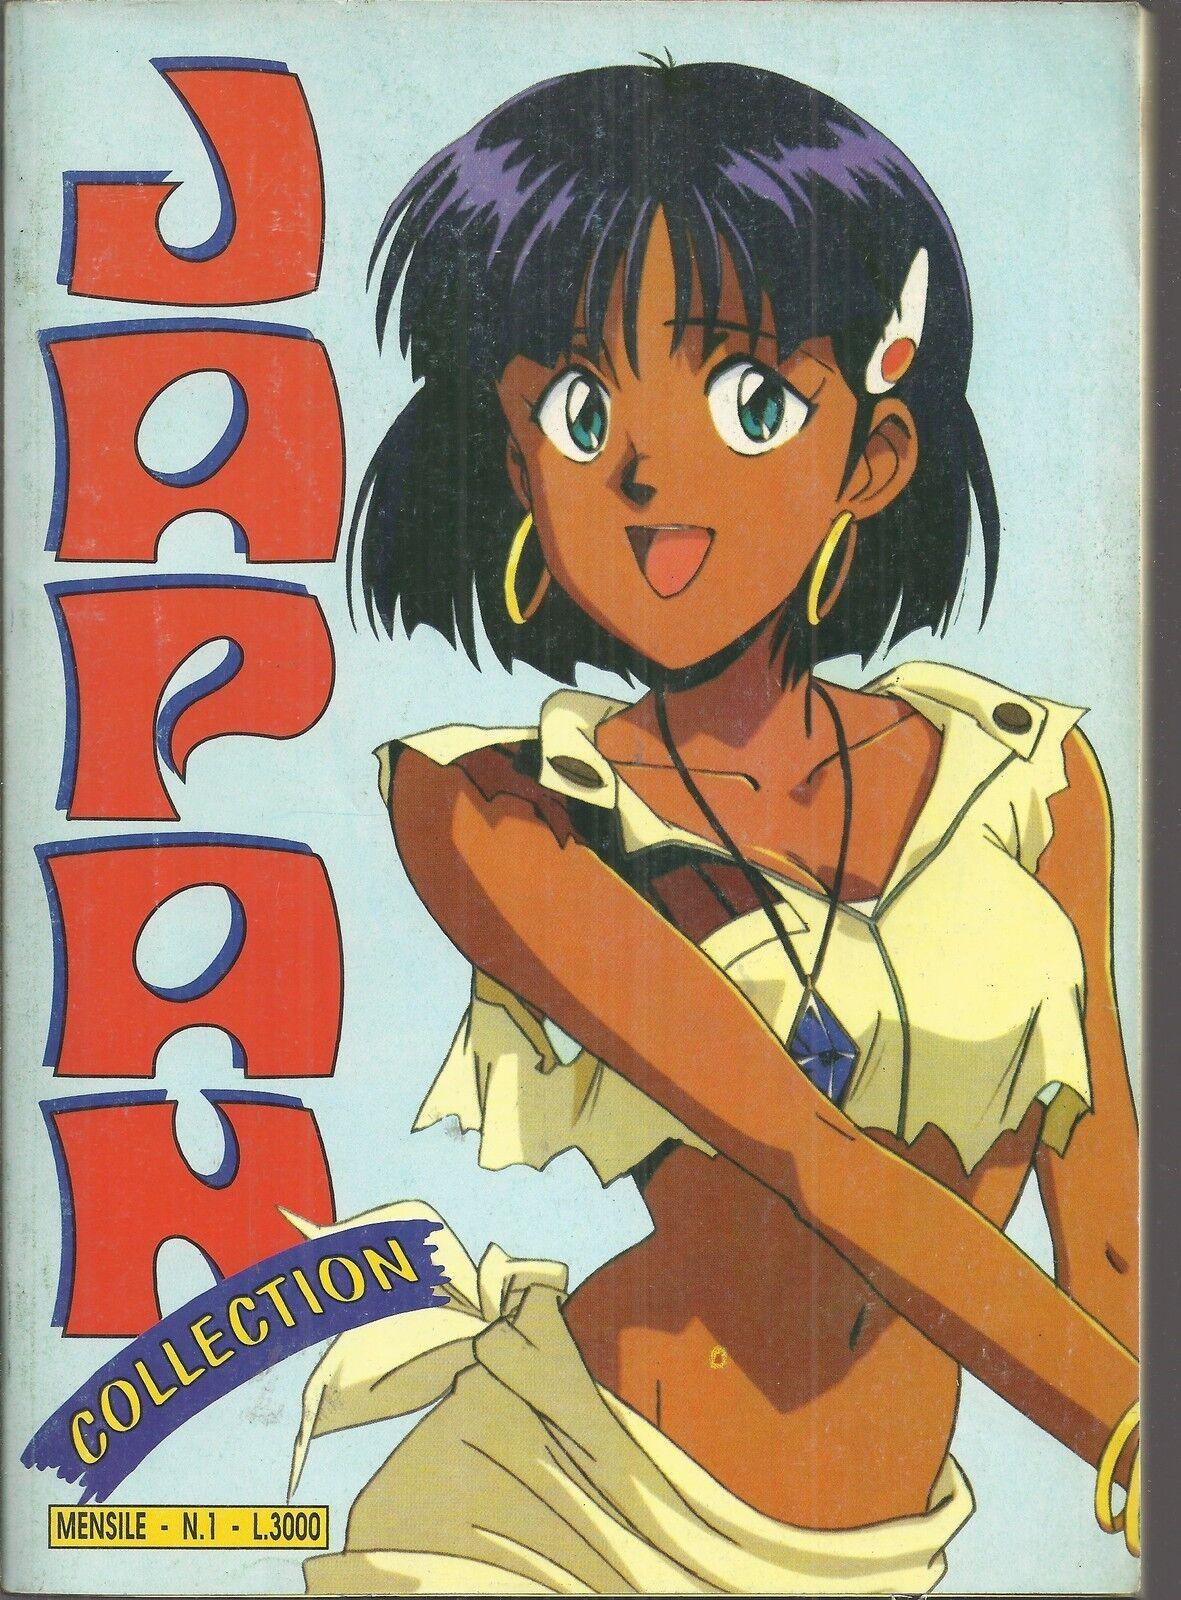 JAPAN COLLECTION n° n° n° 1 con adesivi e storia ororake, Mazinga, Jeeg Robot b4e48d